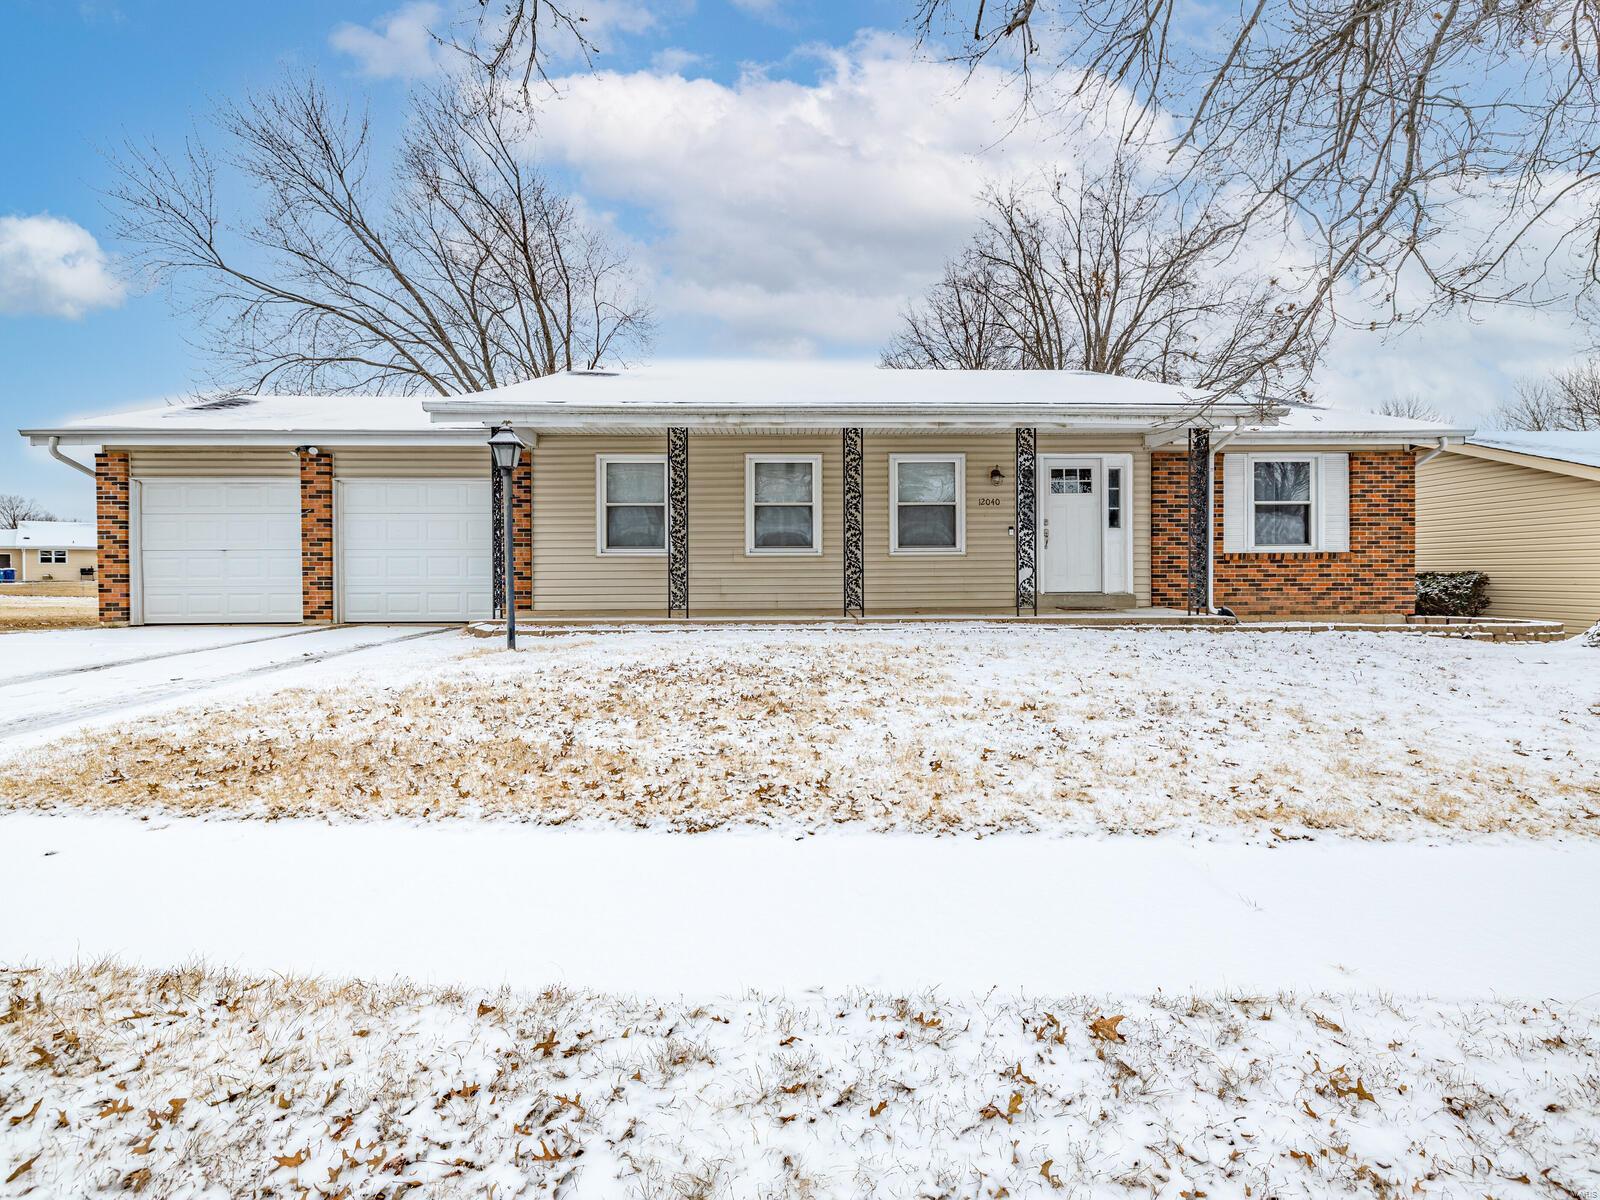 12040 Kingshead Property Photo - Florissant, MO real estate listing